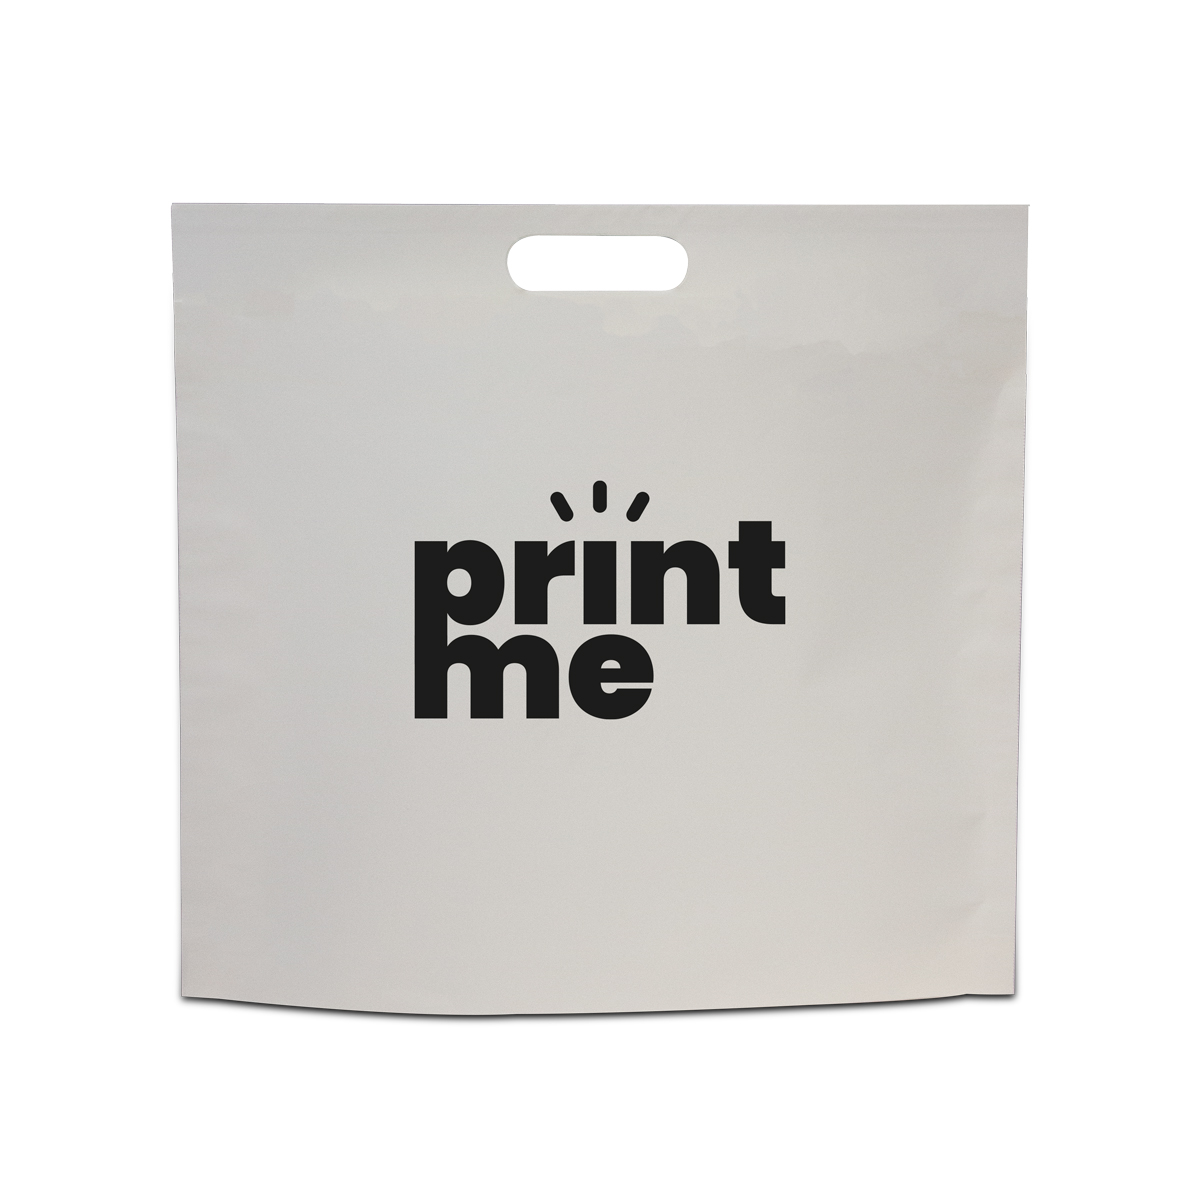 Budget papier tassen met uitgestanst handgreep